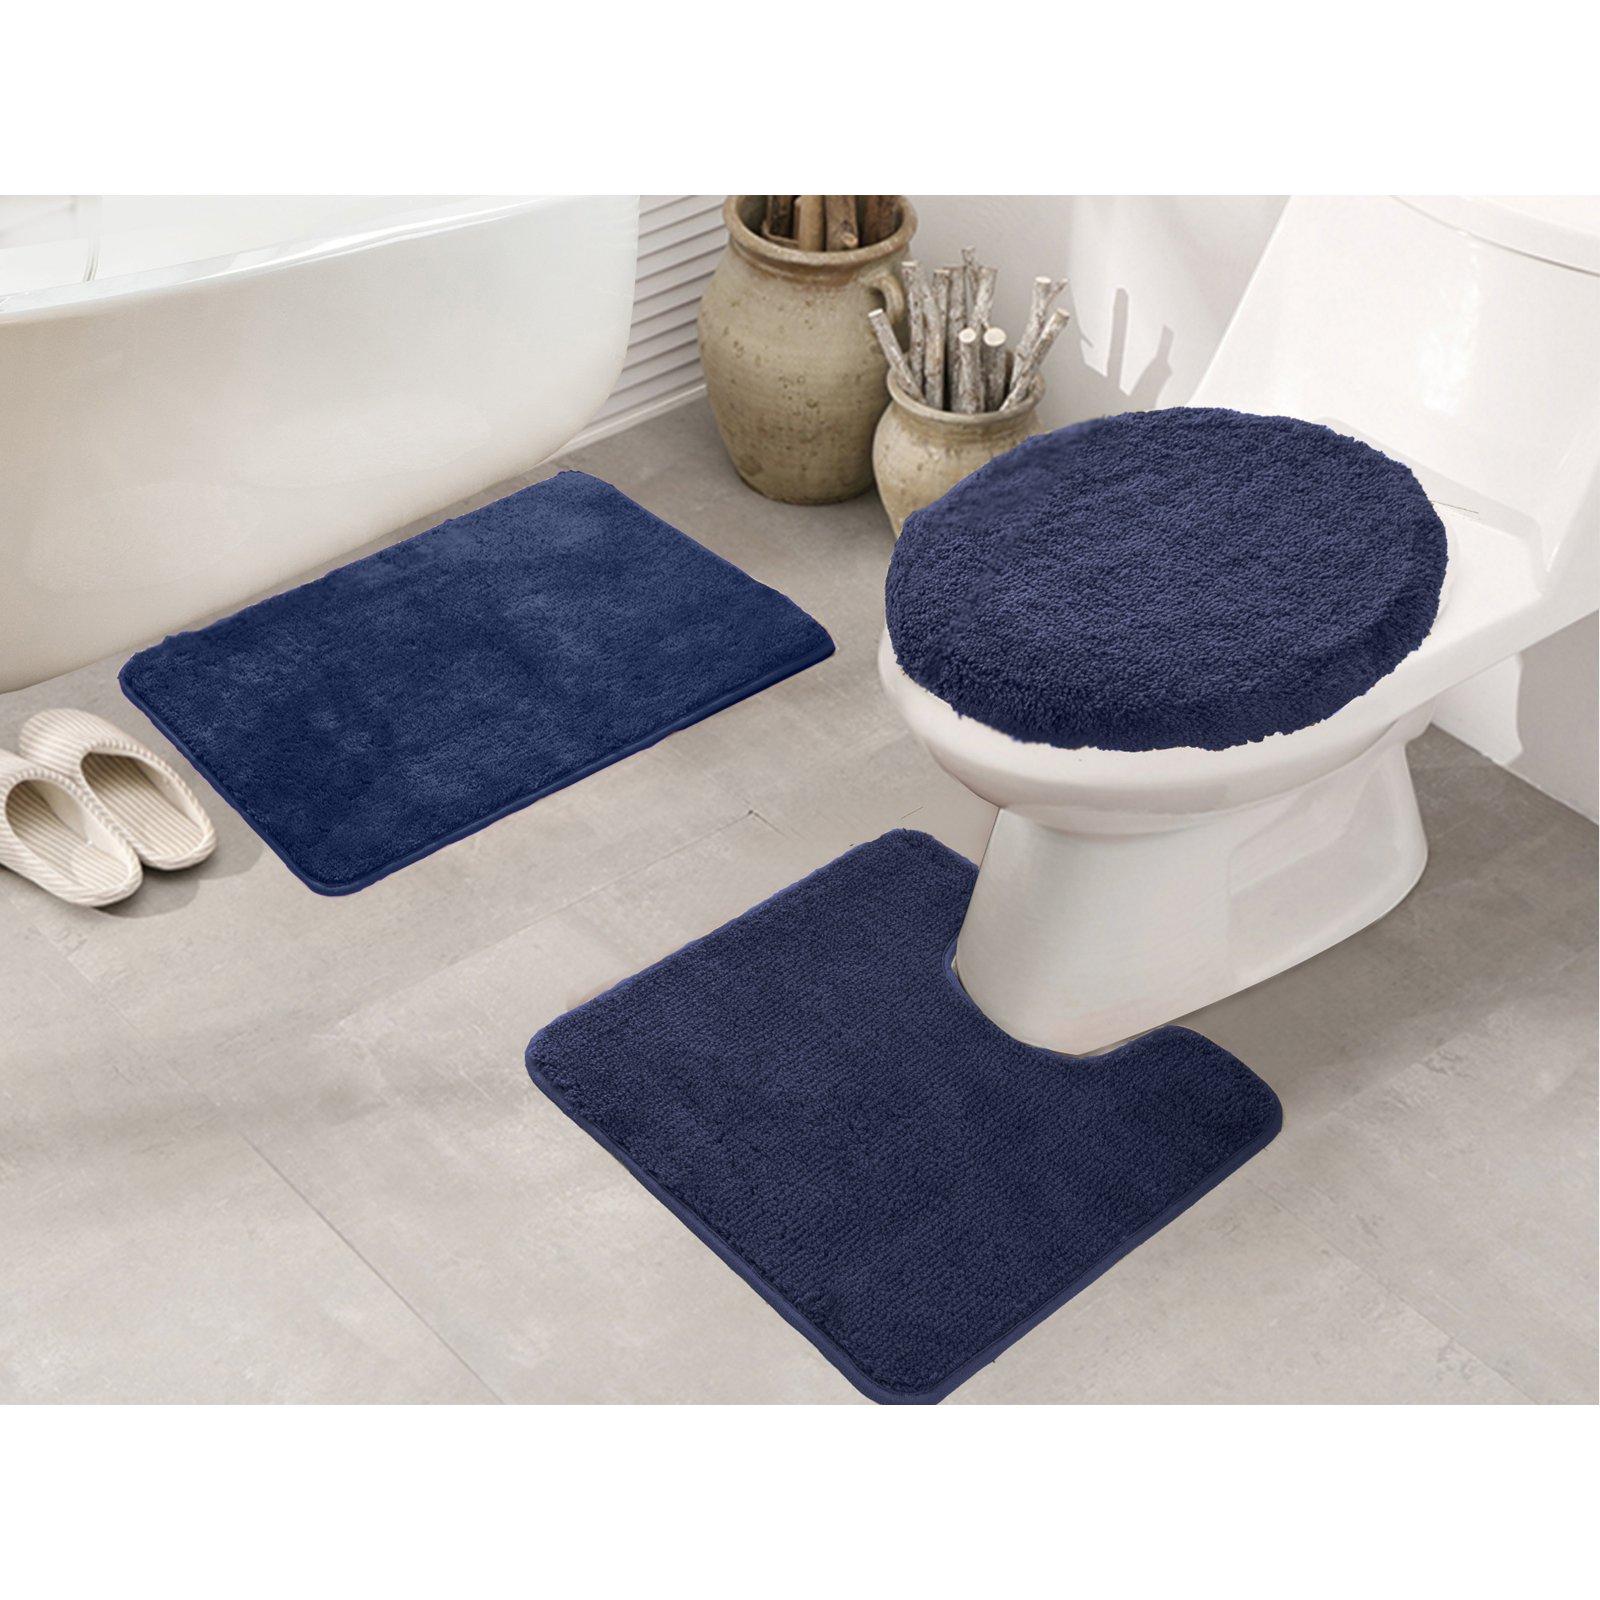 Rt Designers Collection Royalty 3 Piece Bath Rug Set Navy Blue